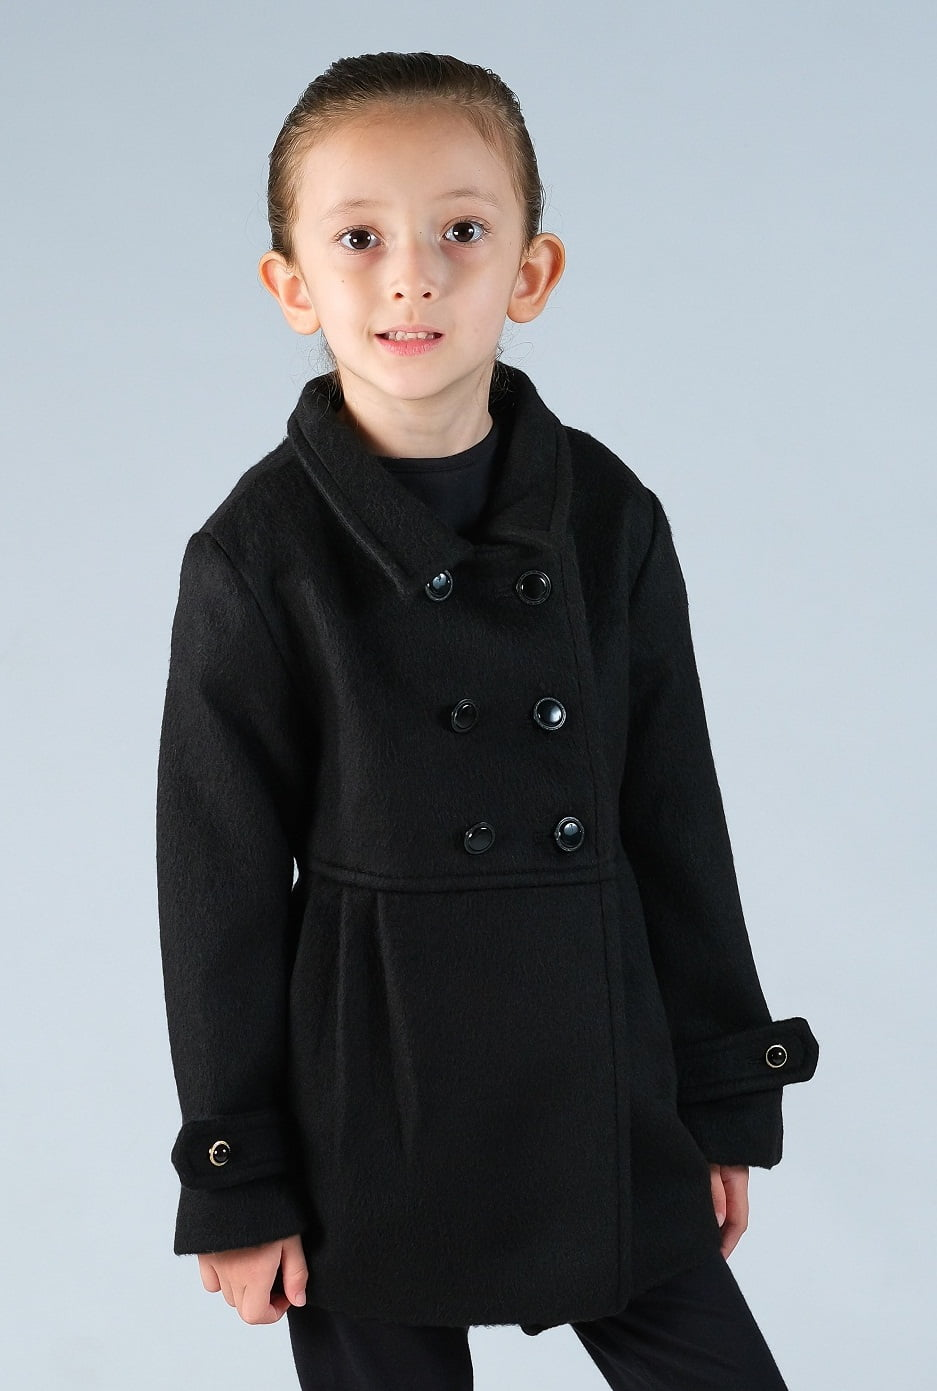 Casaco de lã infantil menina transpassado preto